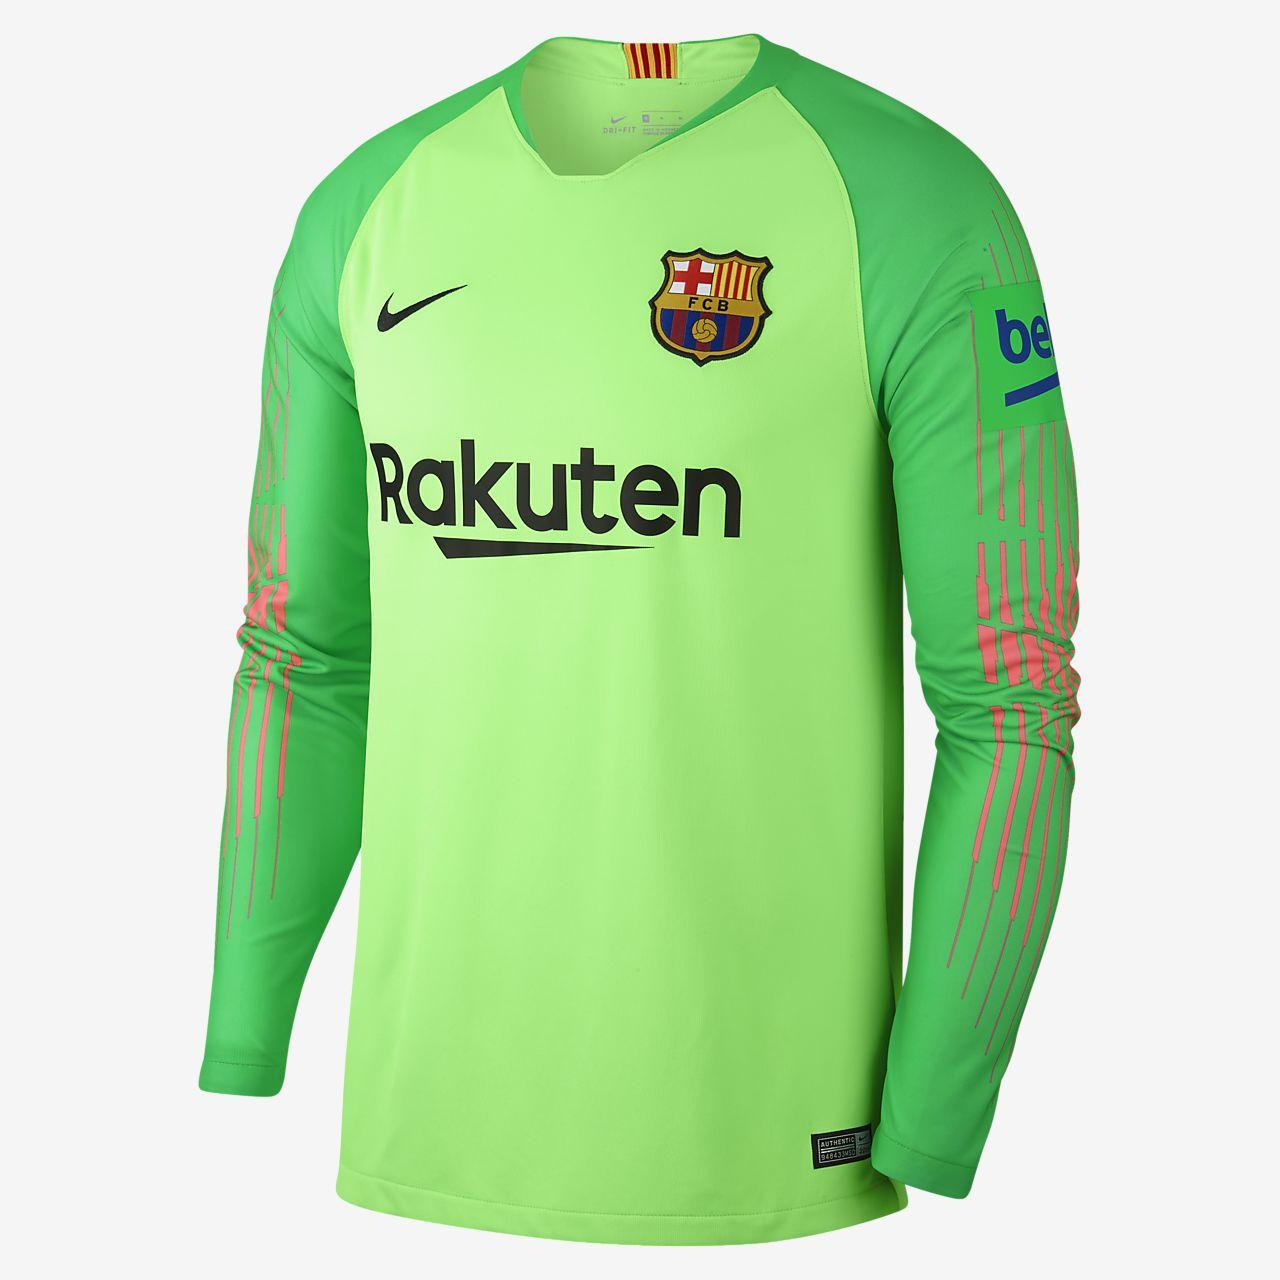 9abff25fcb1ce 2018 19 FC Barcelona Stadium Goalkeeper Camiseta de fútbol - Hombre ...